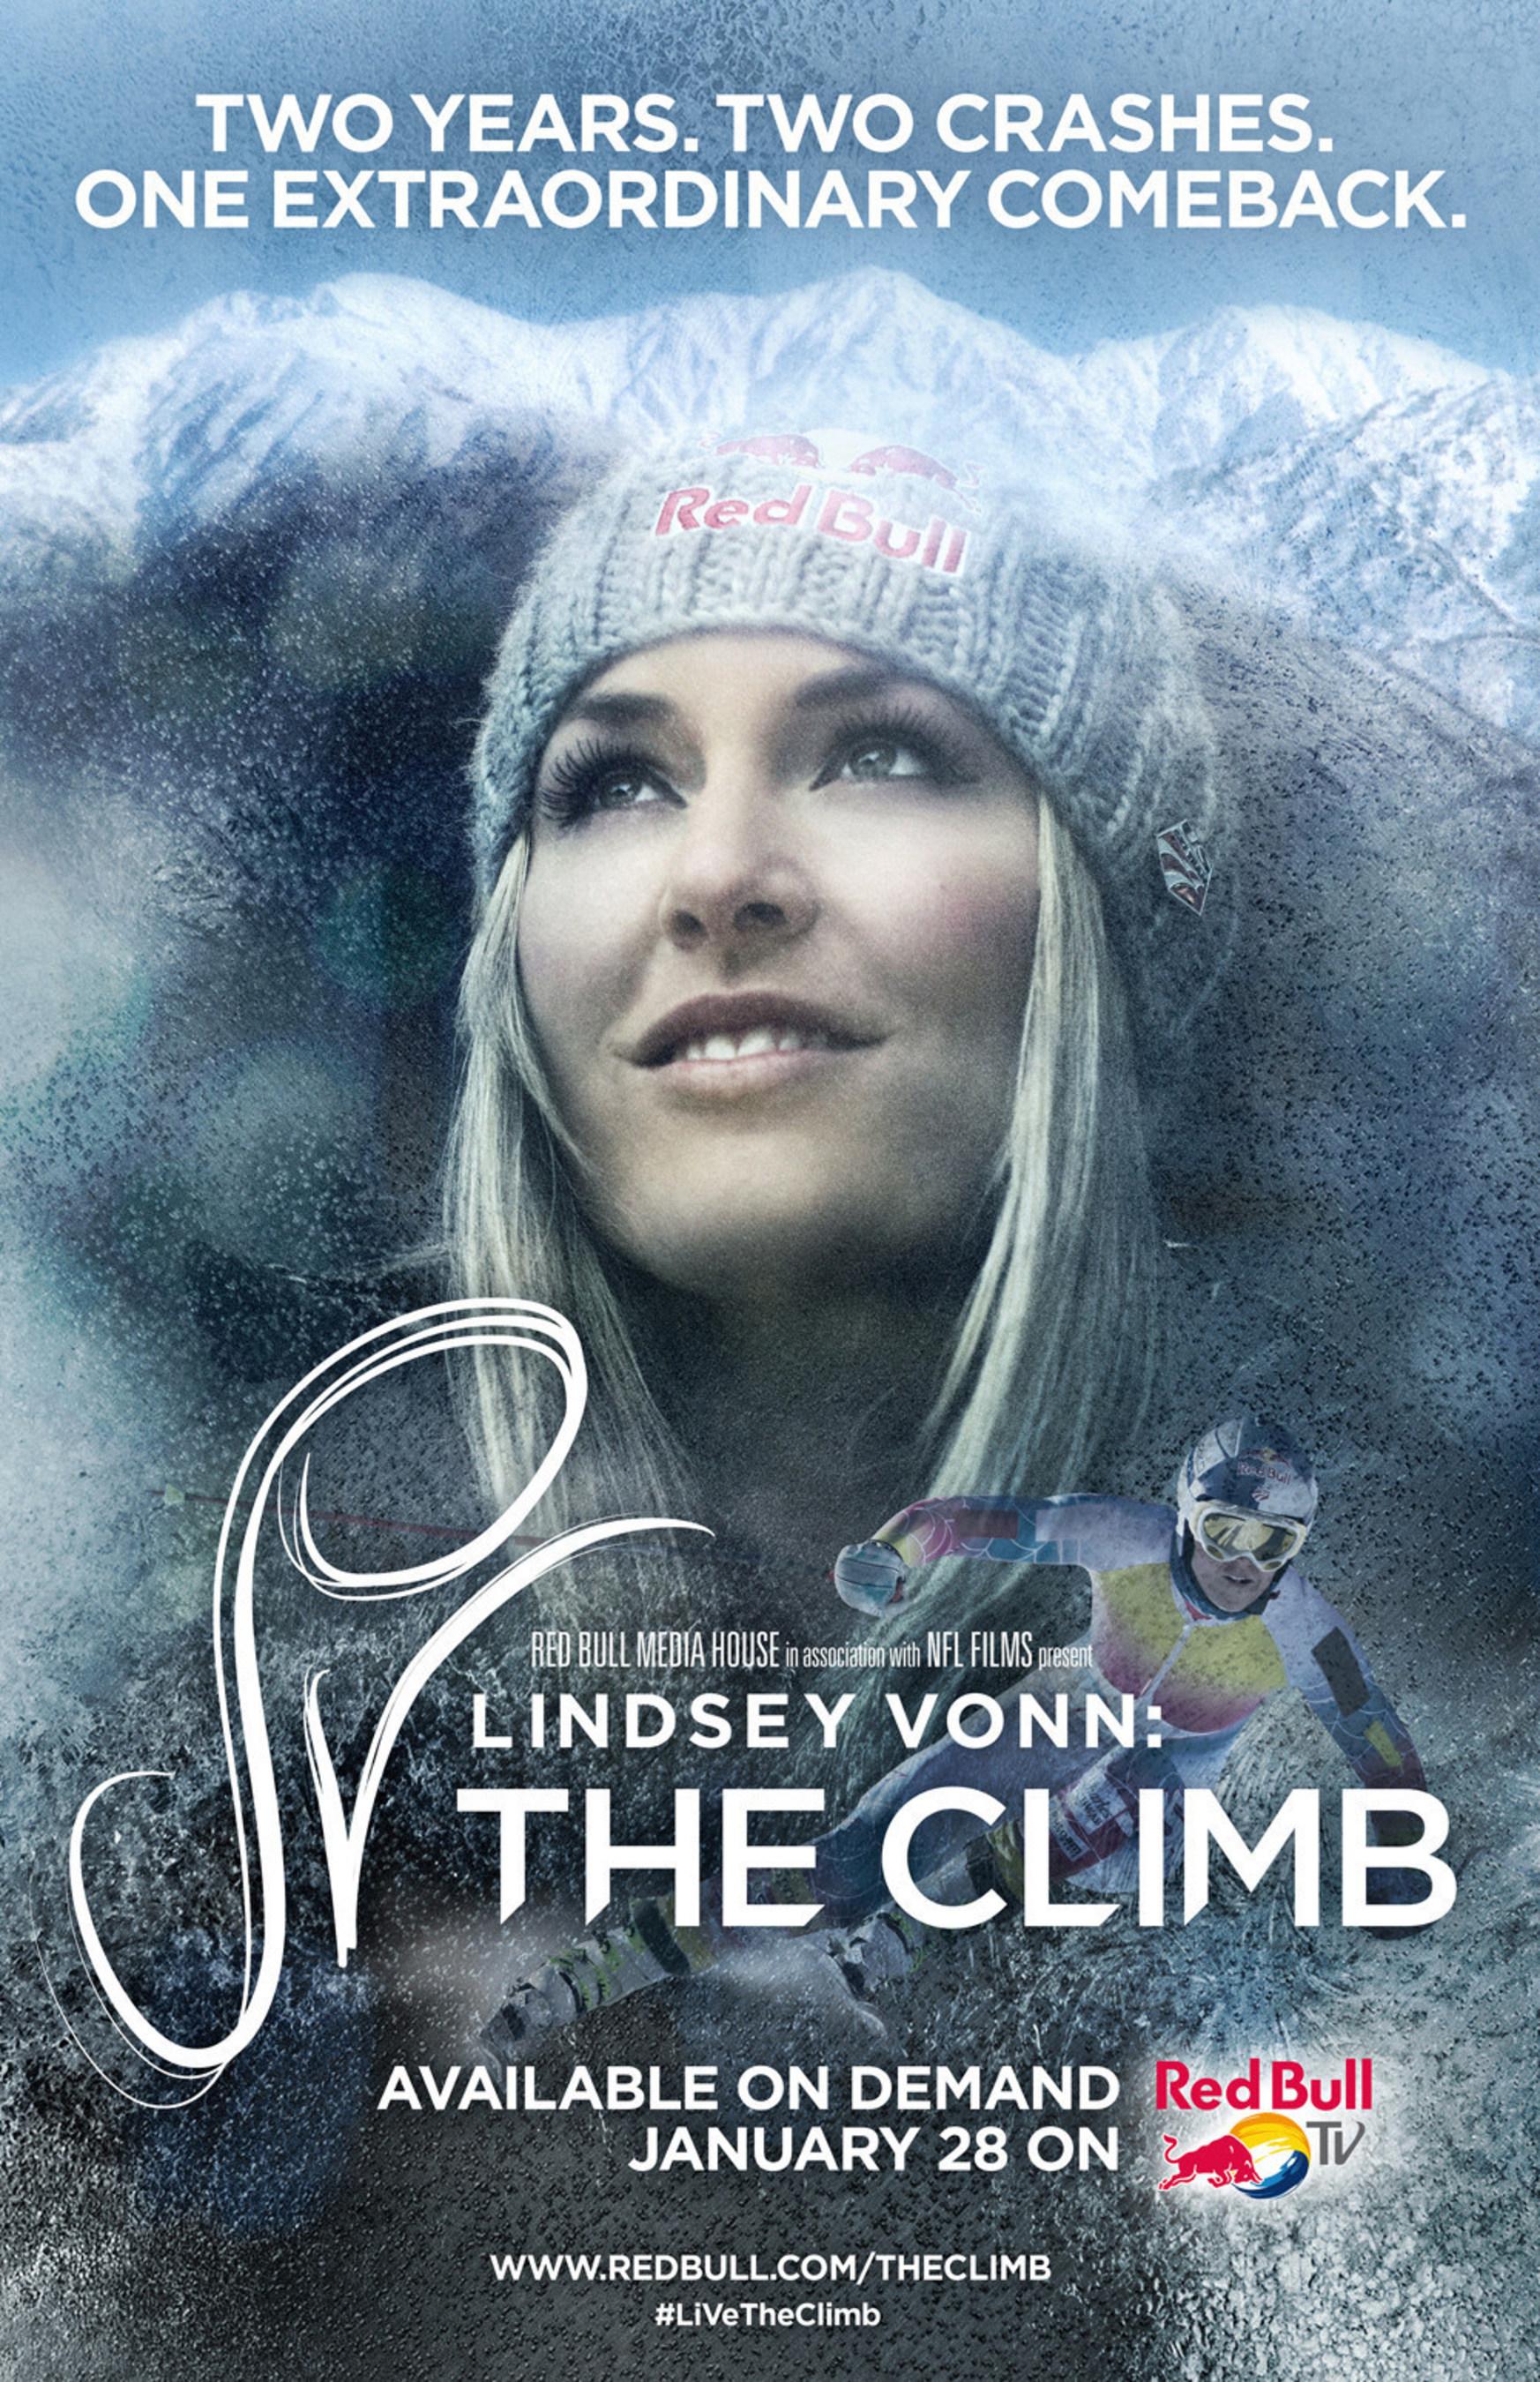 Lindsey Vonn: The Climb debuts on Red Bull TV January 28